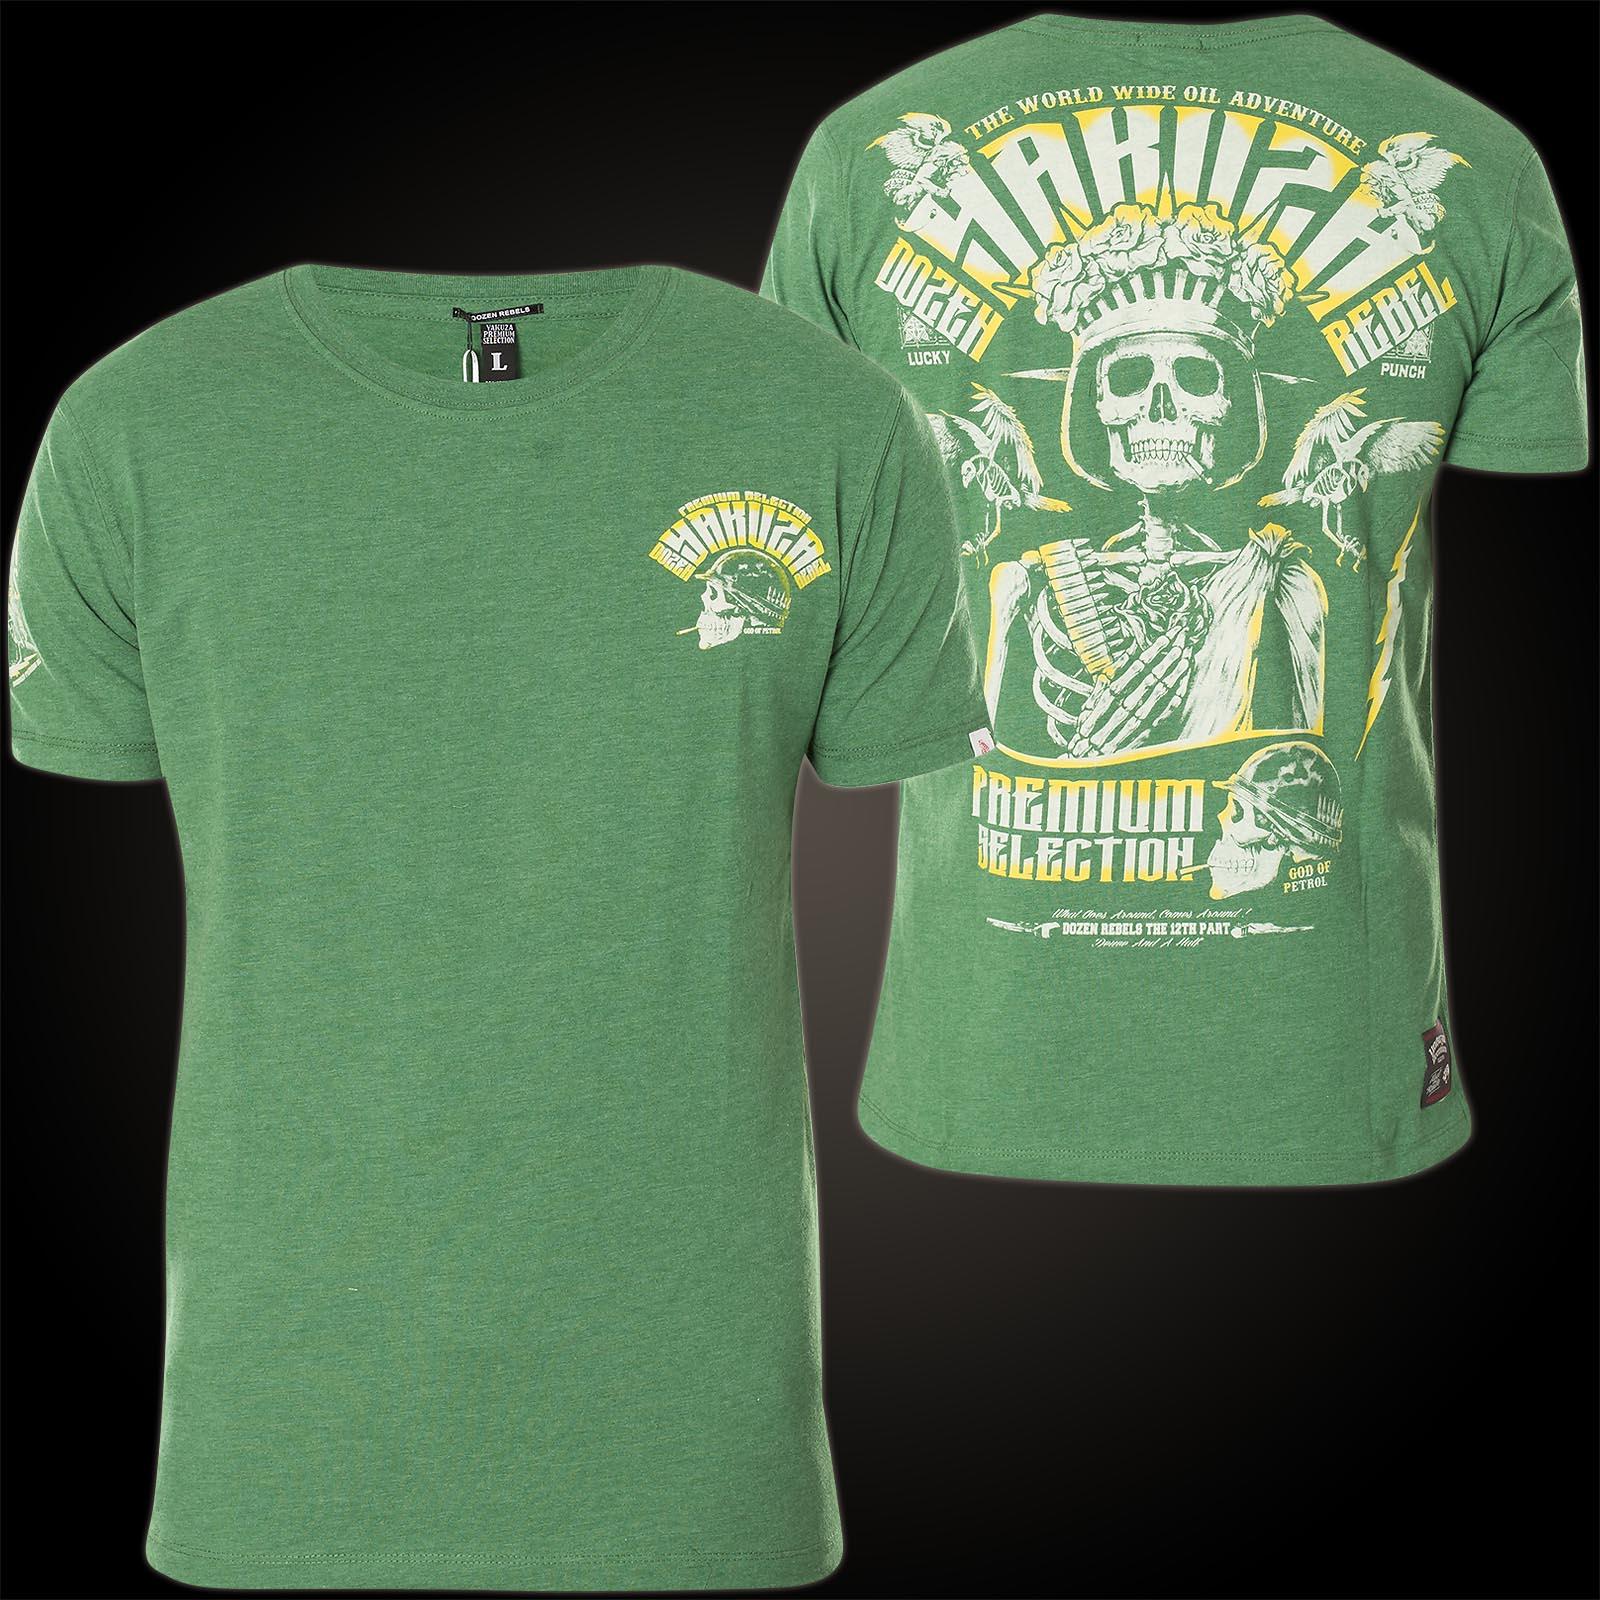 238e494de5d T-shirts Yakuza Premium T-Shirt 2414 schwarz